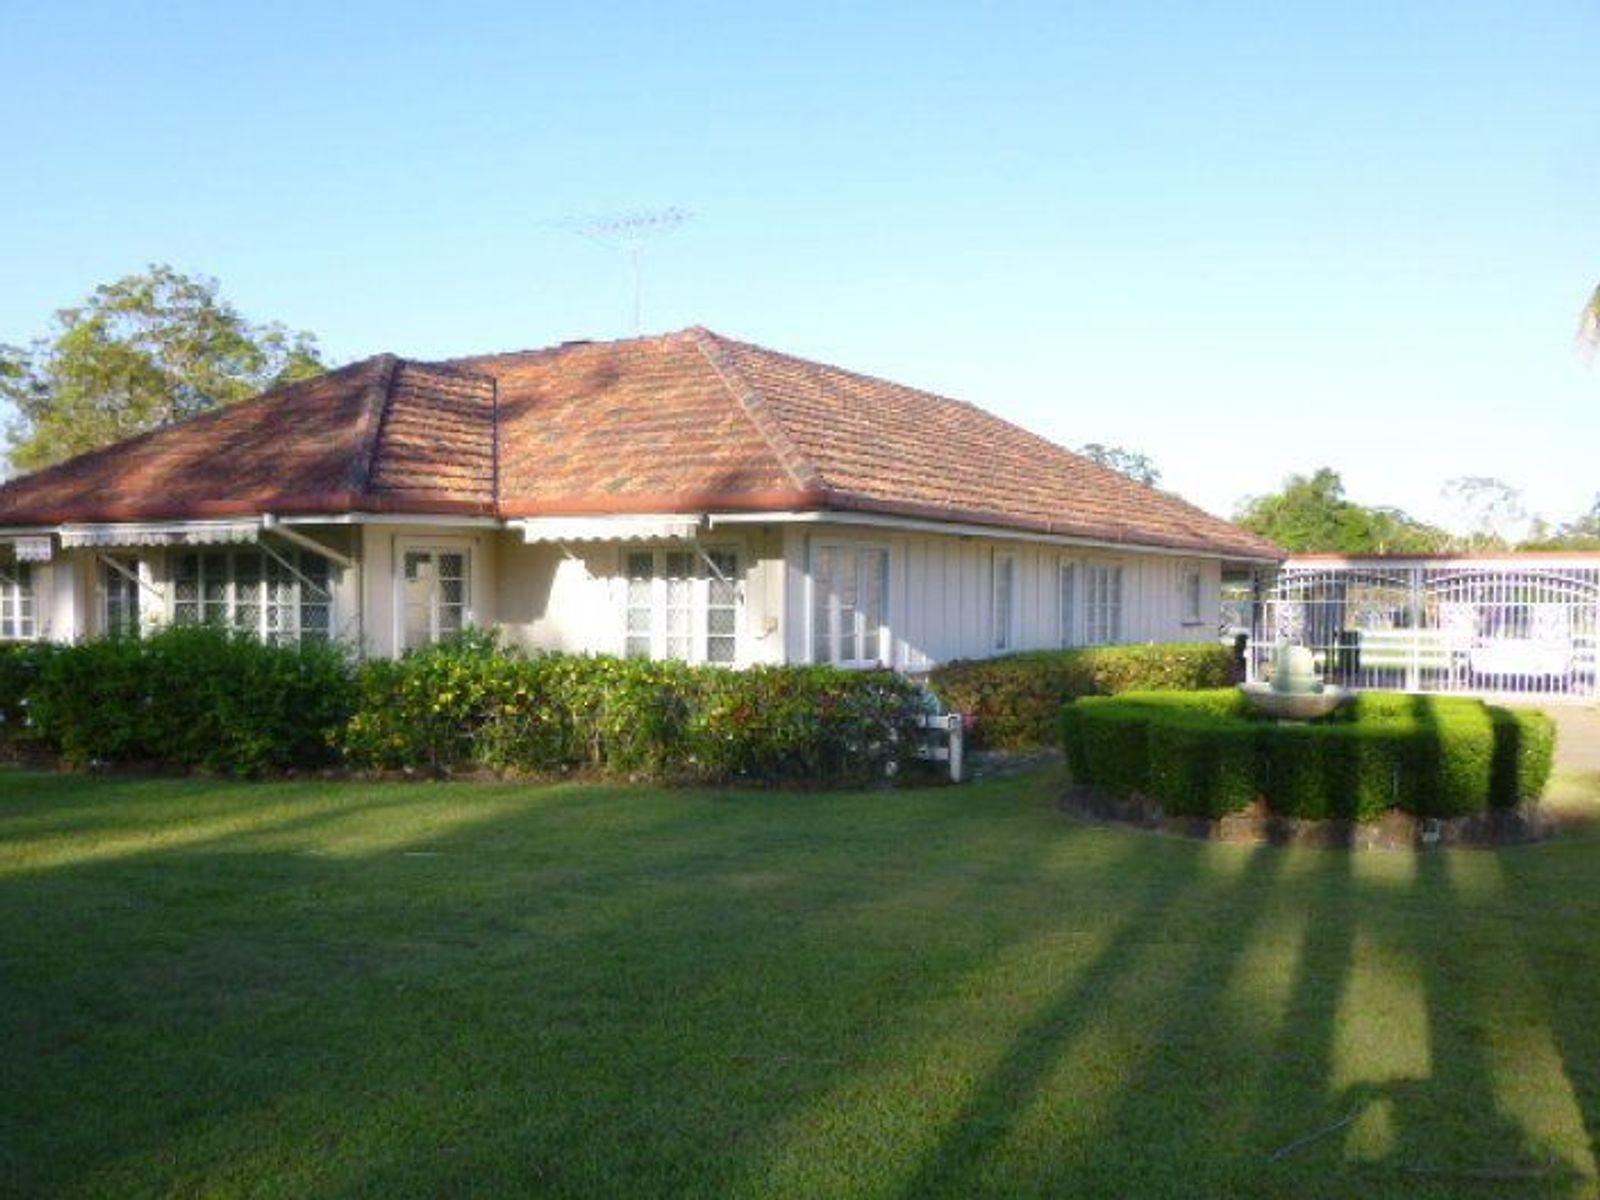 1876 Steve Irwin Way, Landsborough, QLD 4550